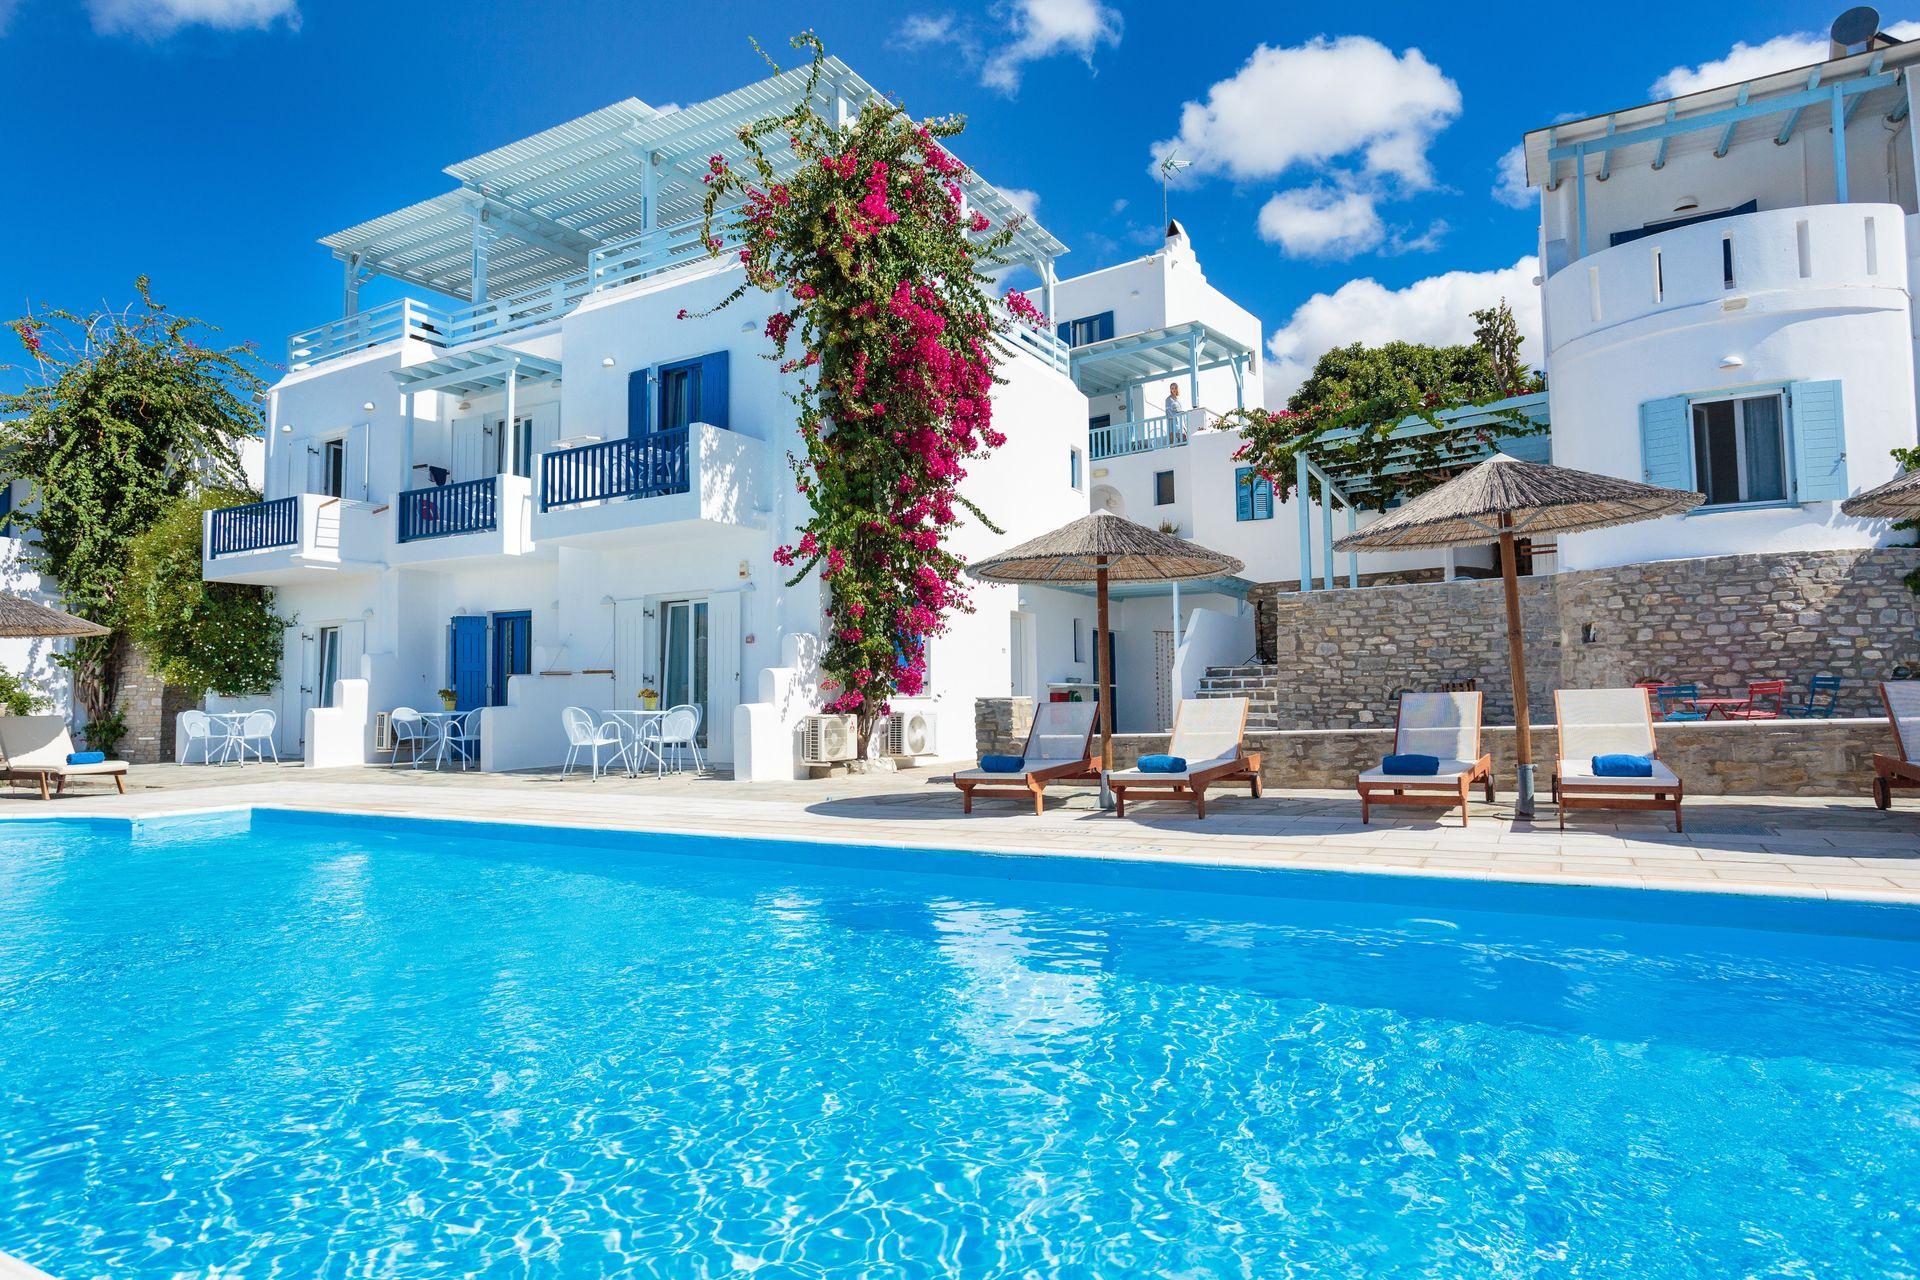 4* Pyrgaki Hotel - Πάρος ✦ 3 Ημέρες (2 Διανυκτερεύσεις) ✦ 2 άτομα ✦ Πρωινό ✦ 01/07/2021 έως 31/07/2021 ✦ Θαυμάσια Τοποθεσία!